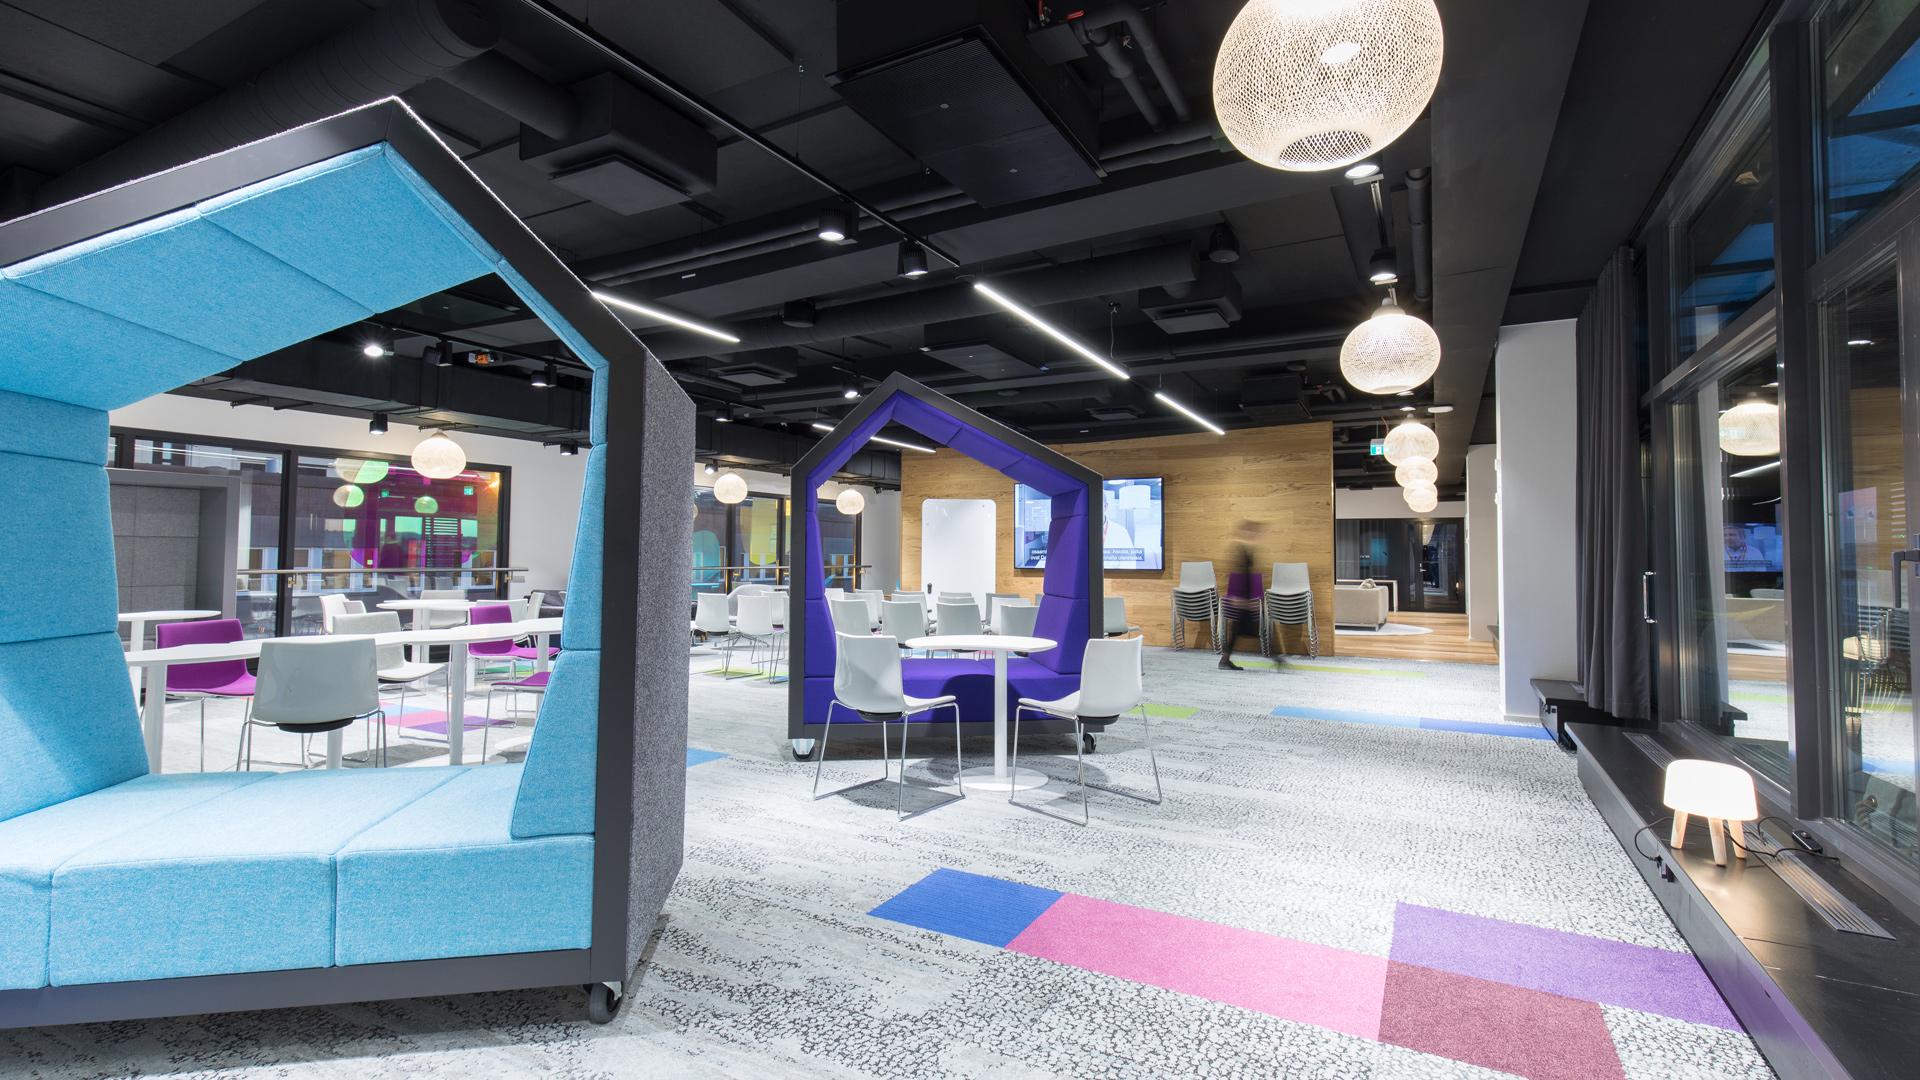 Telia-Finland-Headquarters-Teollisuuskatu-GI-Project-5